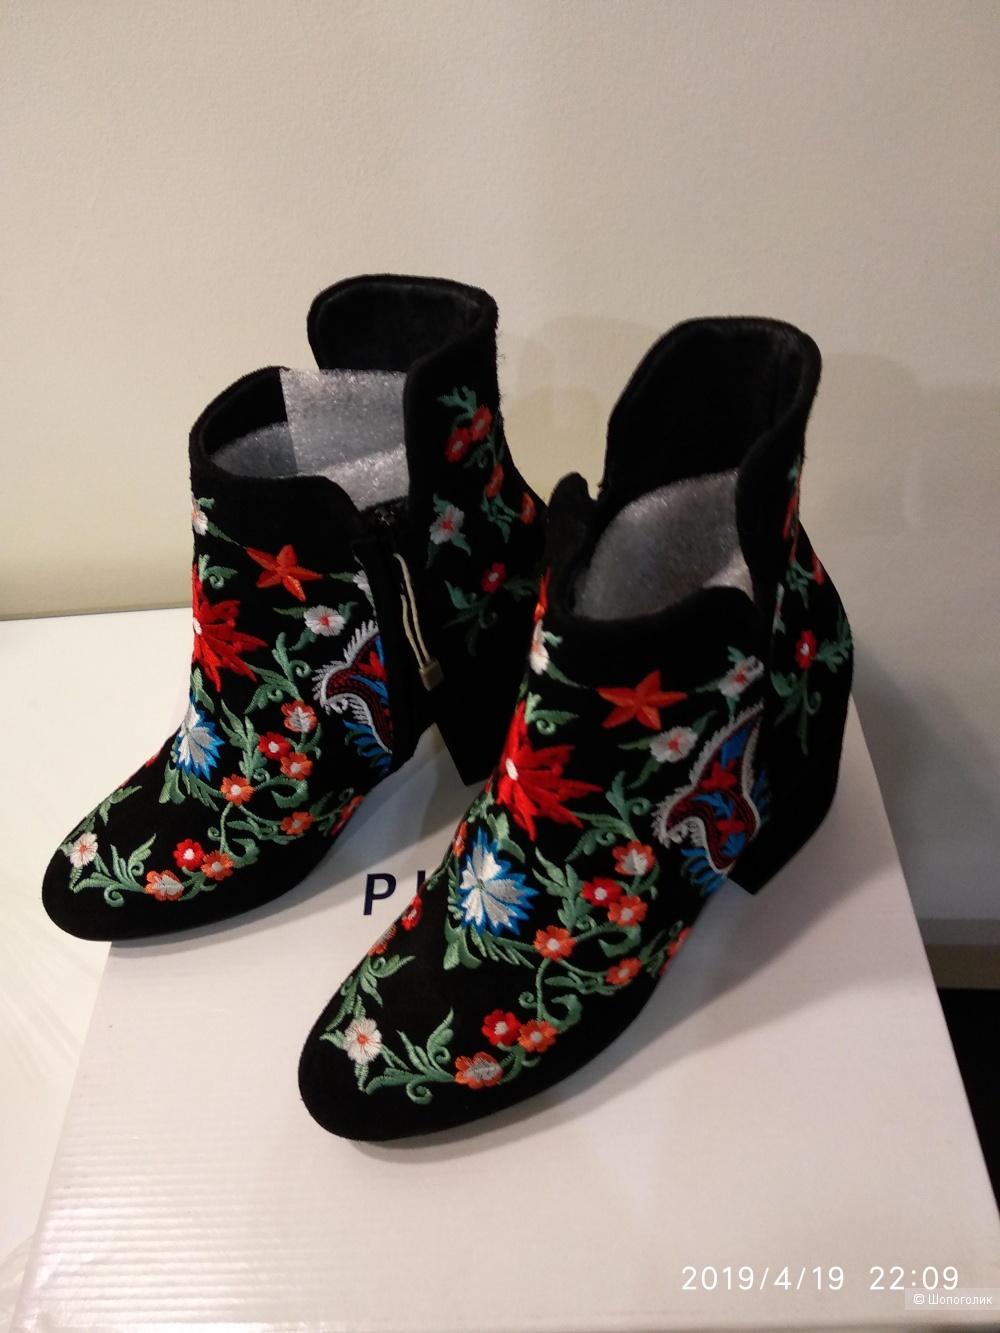 Ботинки PIECES, 37 размер